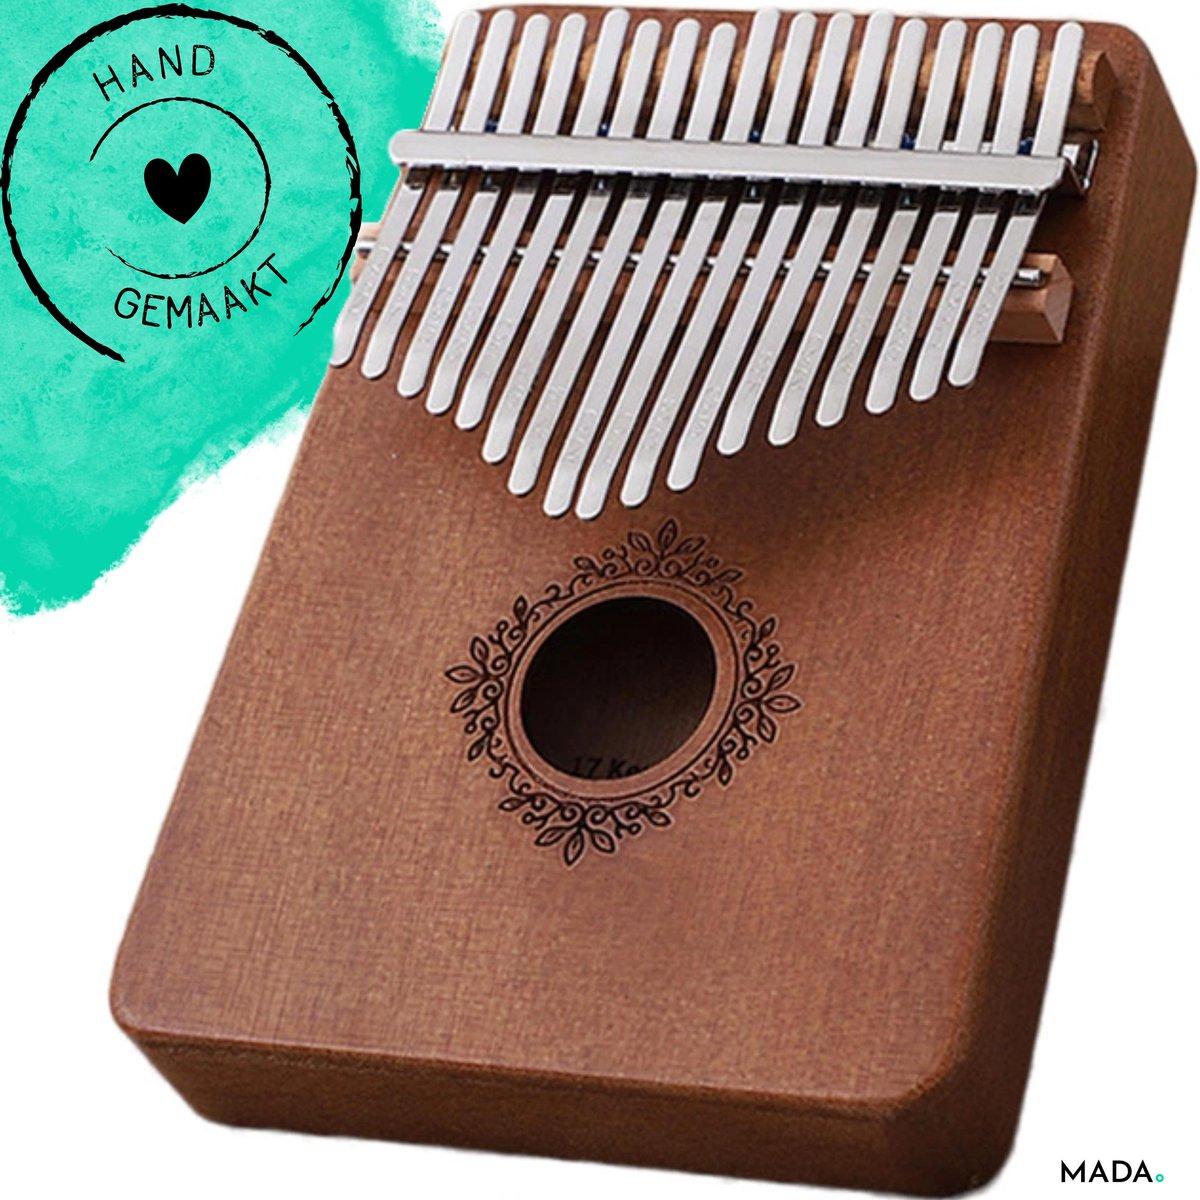 Handgemaakte kalimba / duimpiano - 17 tonen - Kalimba muziekinstrument - Complete set incl. opbergta